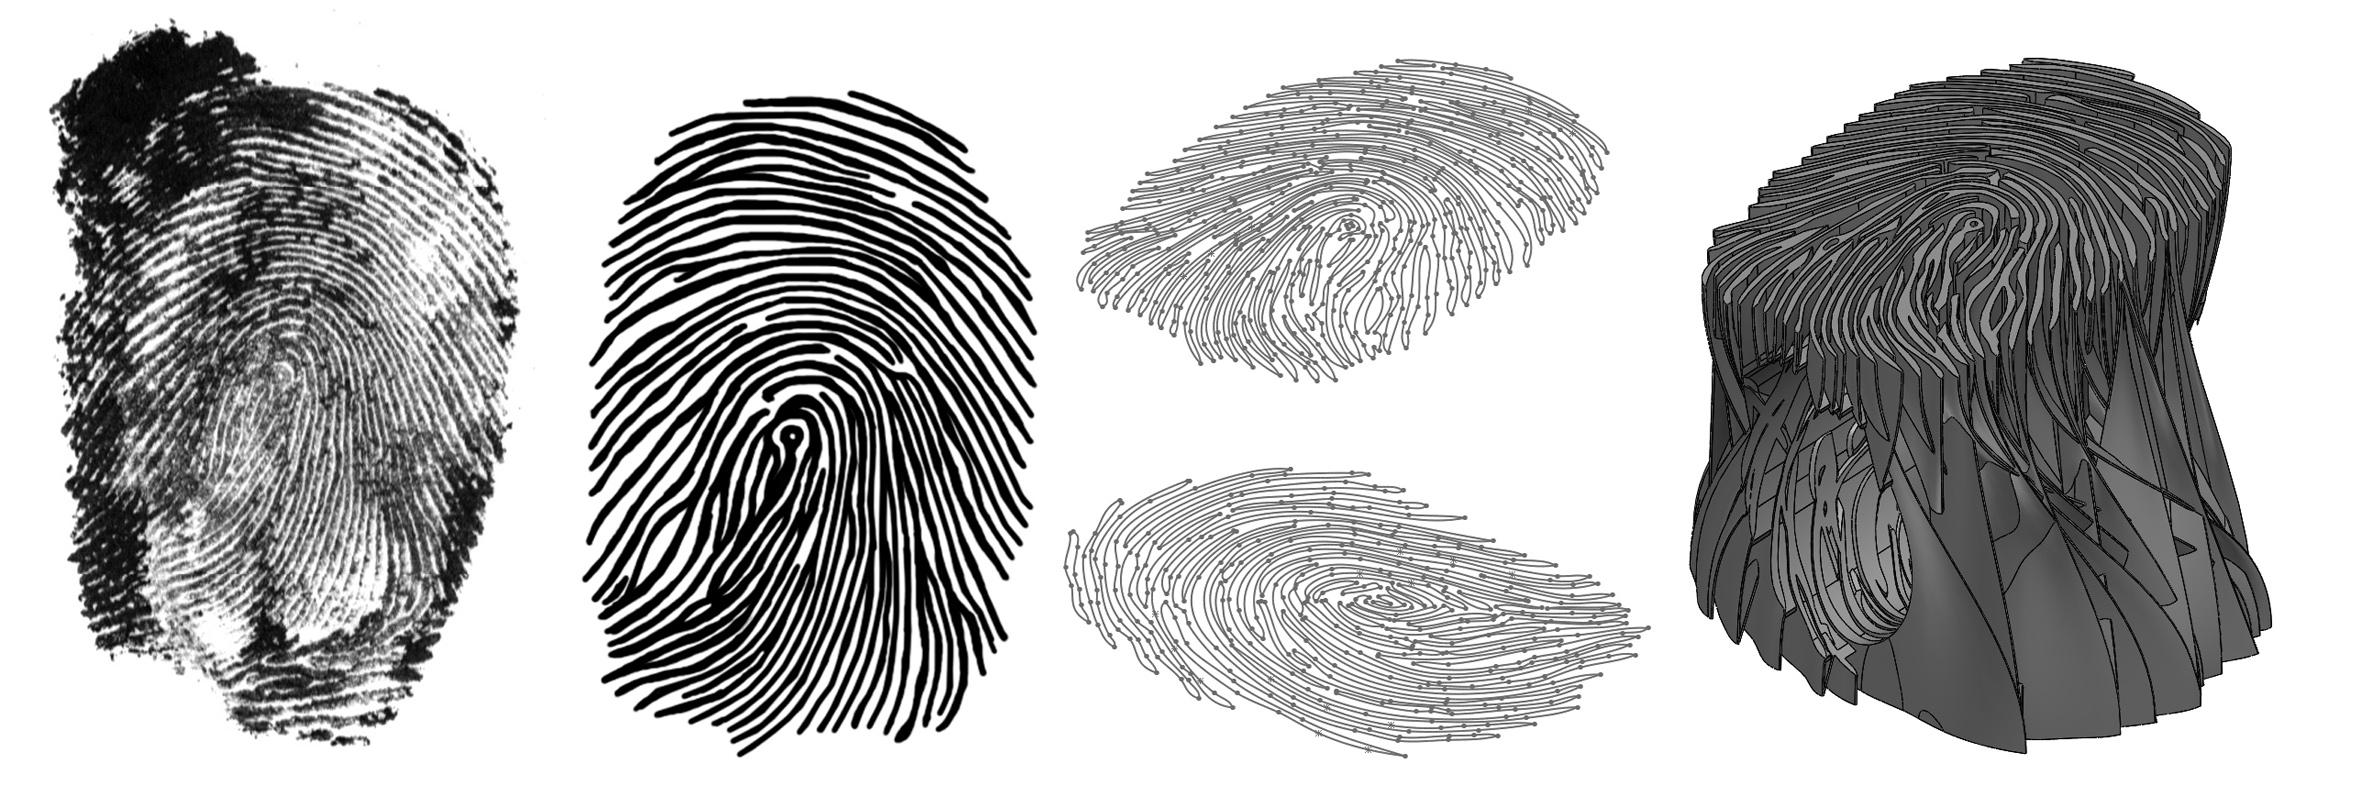 Models of the fingerprint and the stool. Image via BigRep.